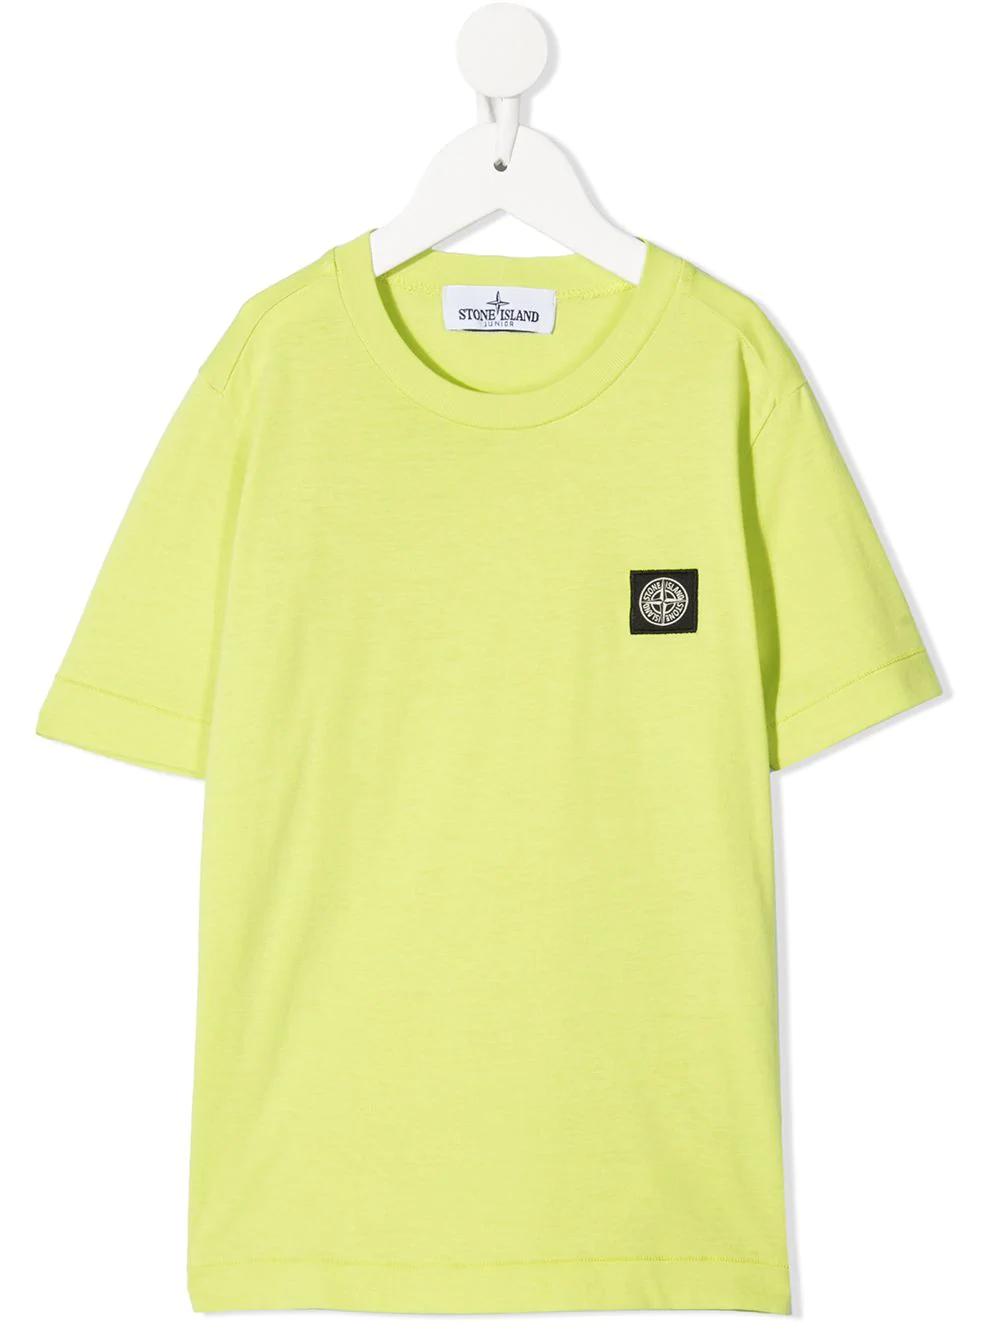 STONE ISLAND JUNIOR Yellow cotton logo-patch T-shirt